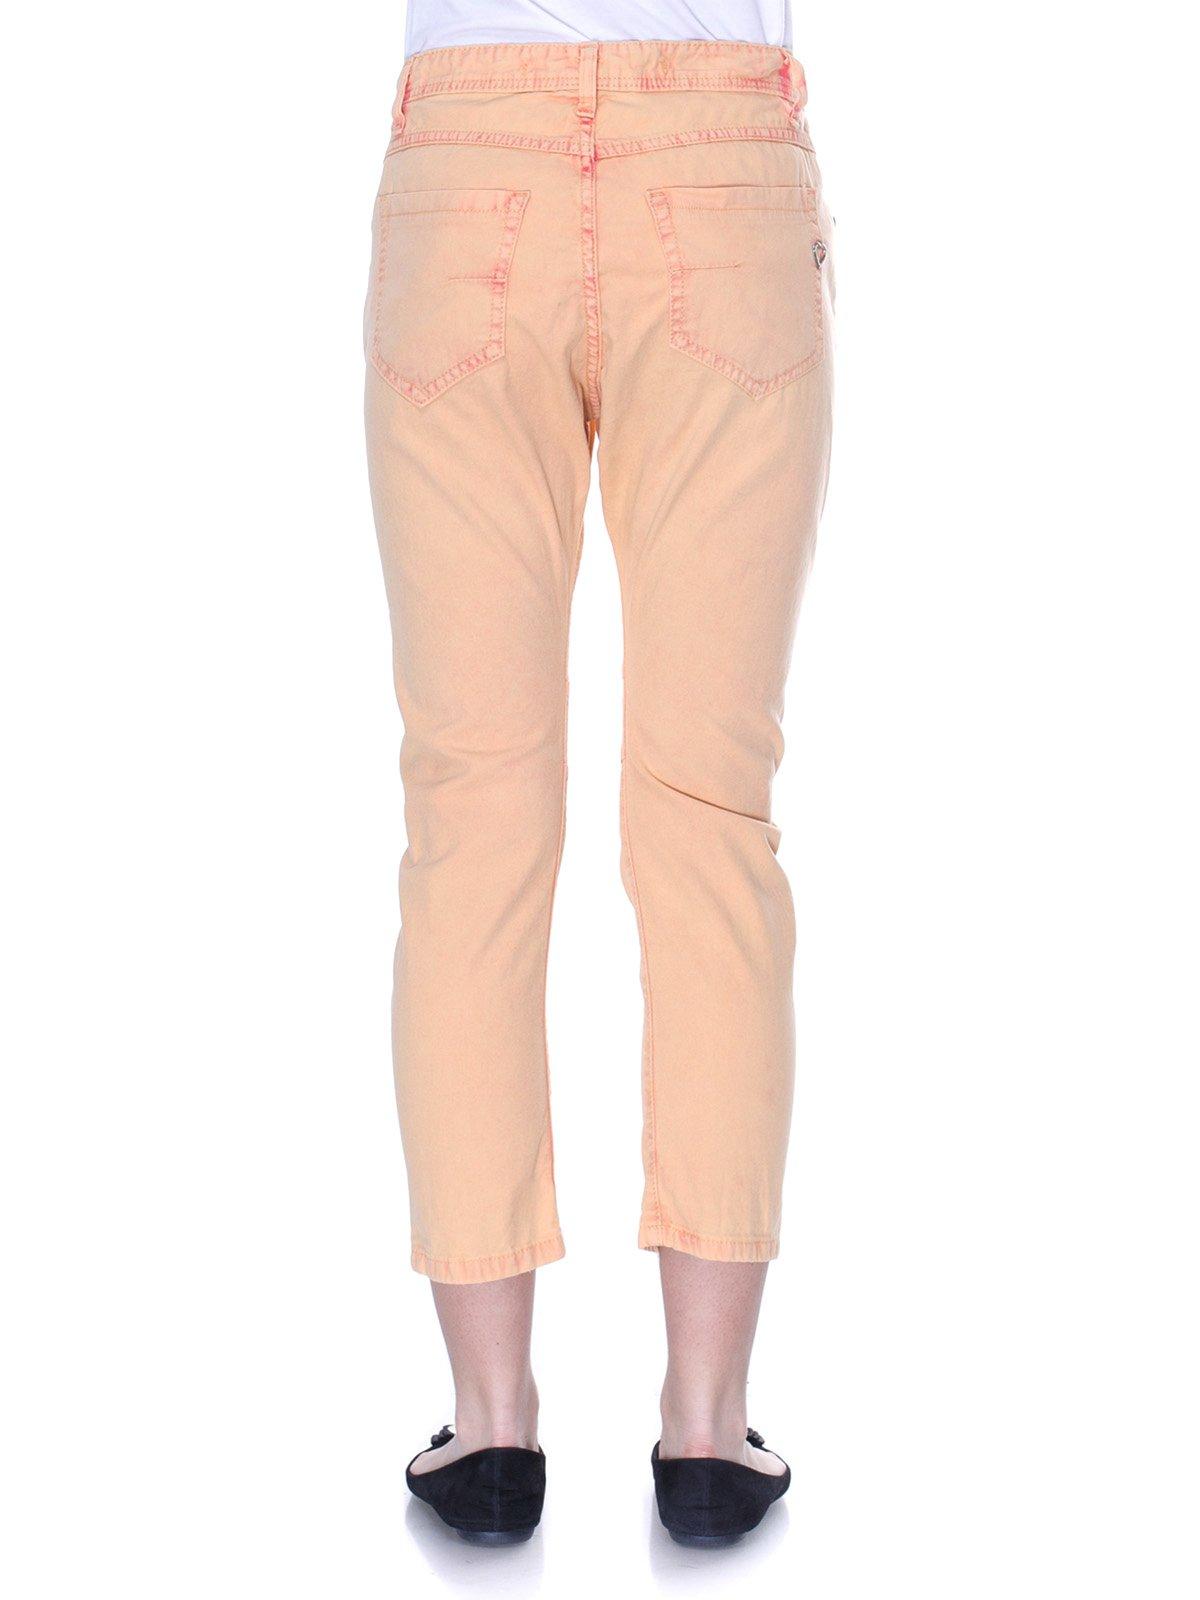 Брюки персикового цвета   3114156   фото 3